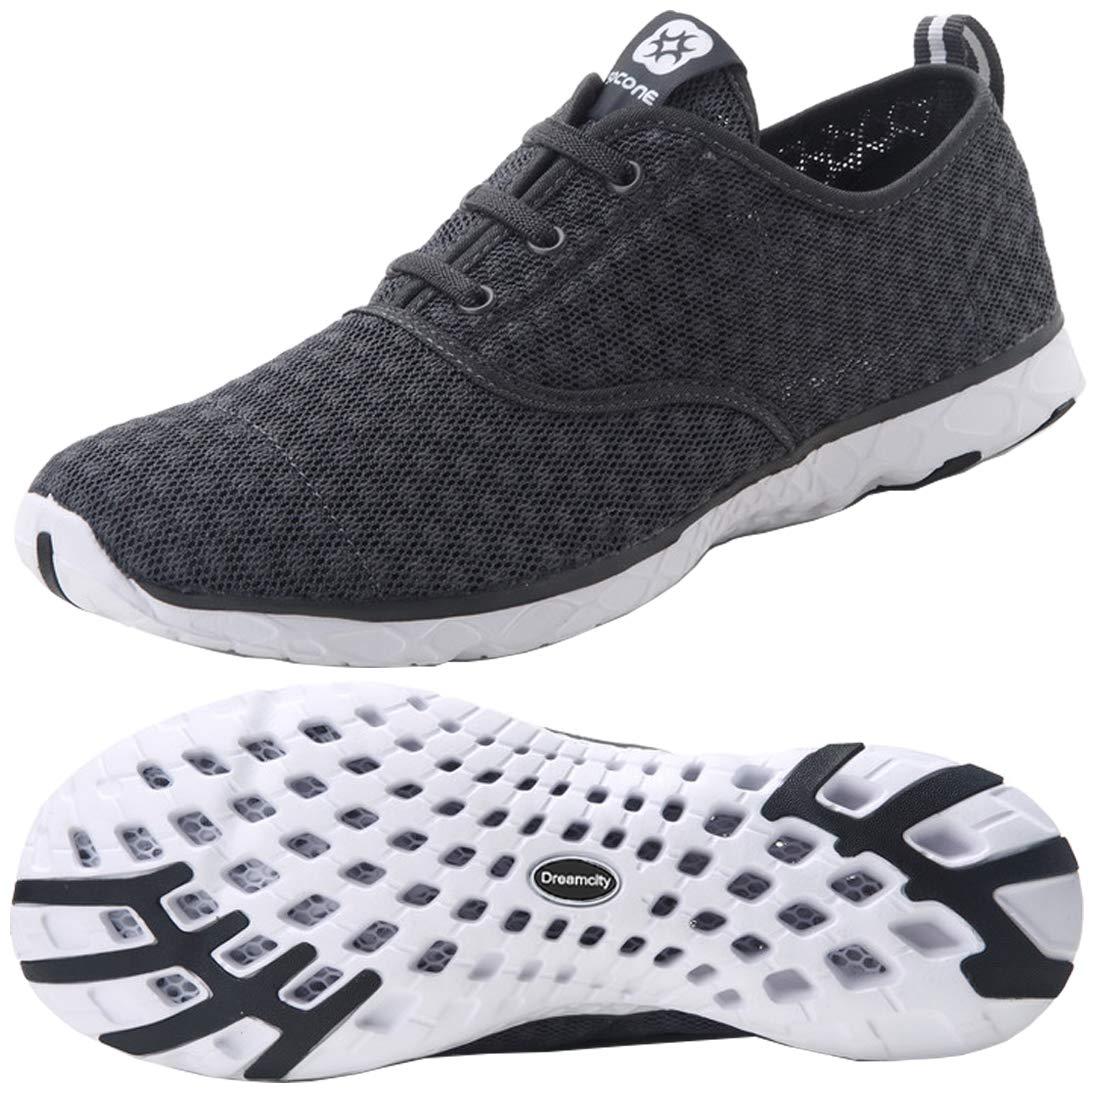 Dreamcity Men's Water Shoes Athletic Sport Lightweight Walking Shoes